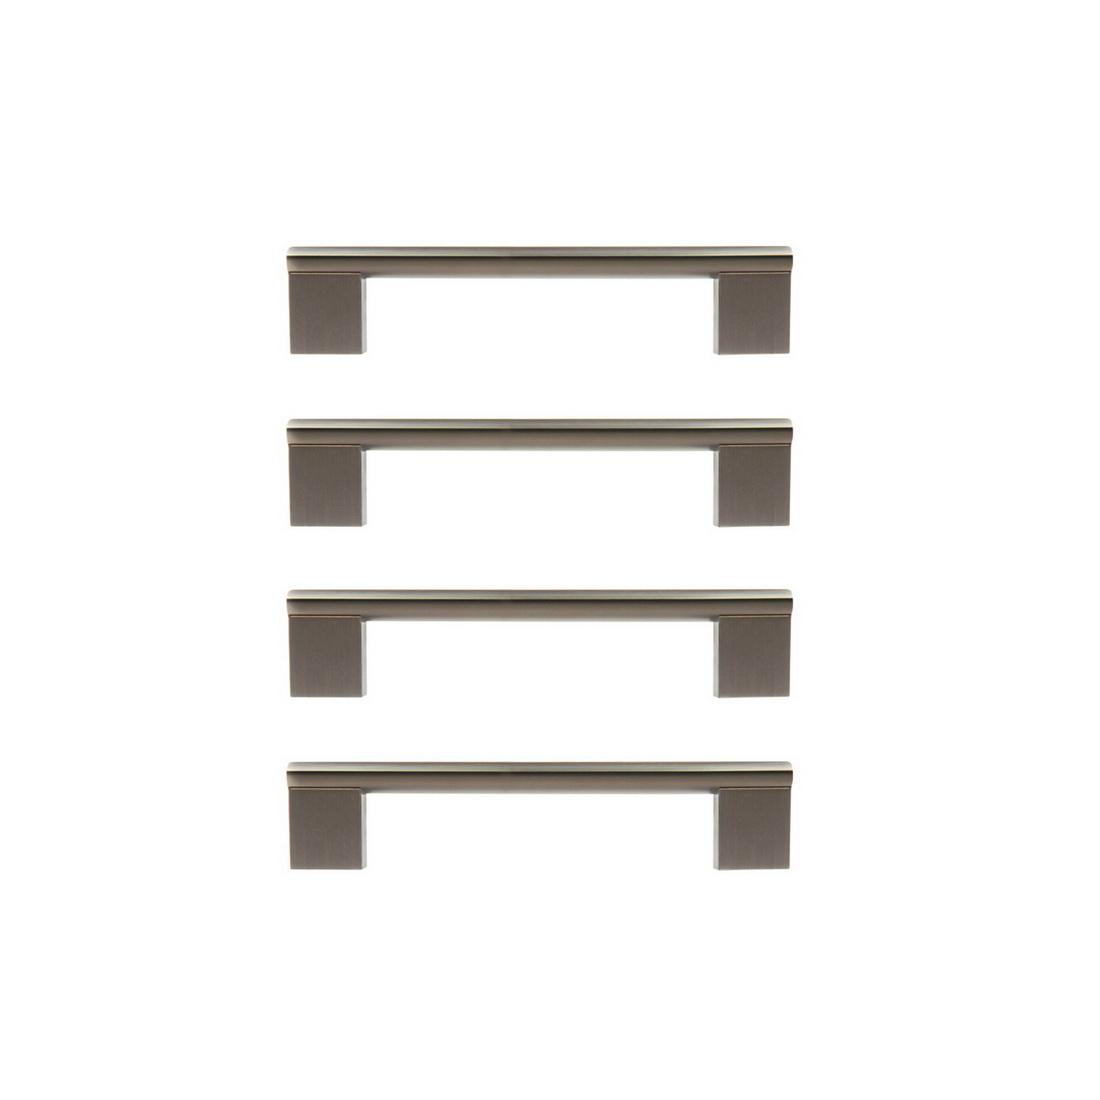 Minerva Cabinet Handle 96mm Zinc Die-Cast Matt Black 4 pack 6413-4-BLK